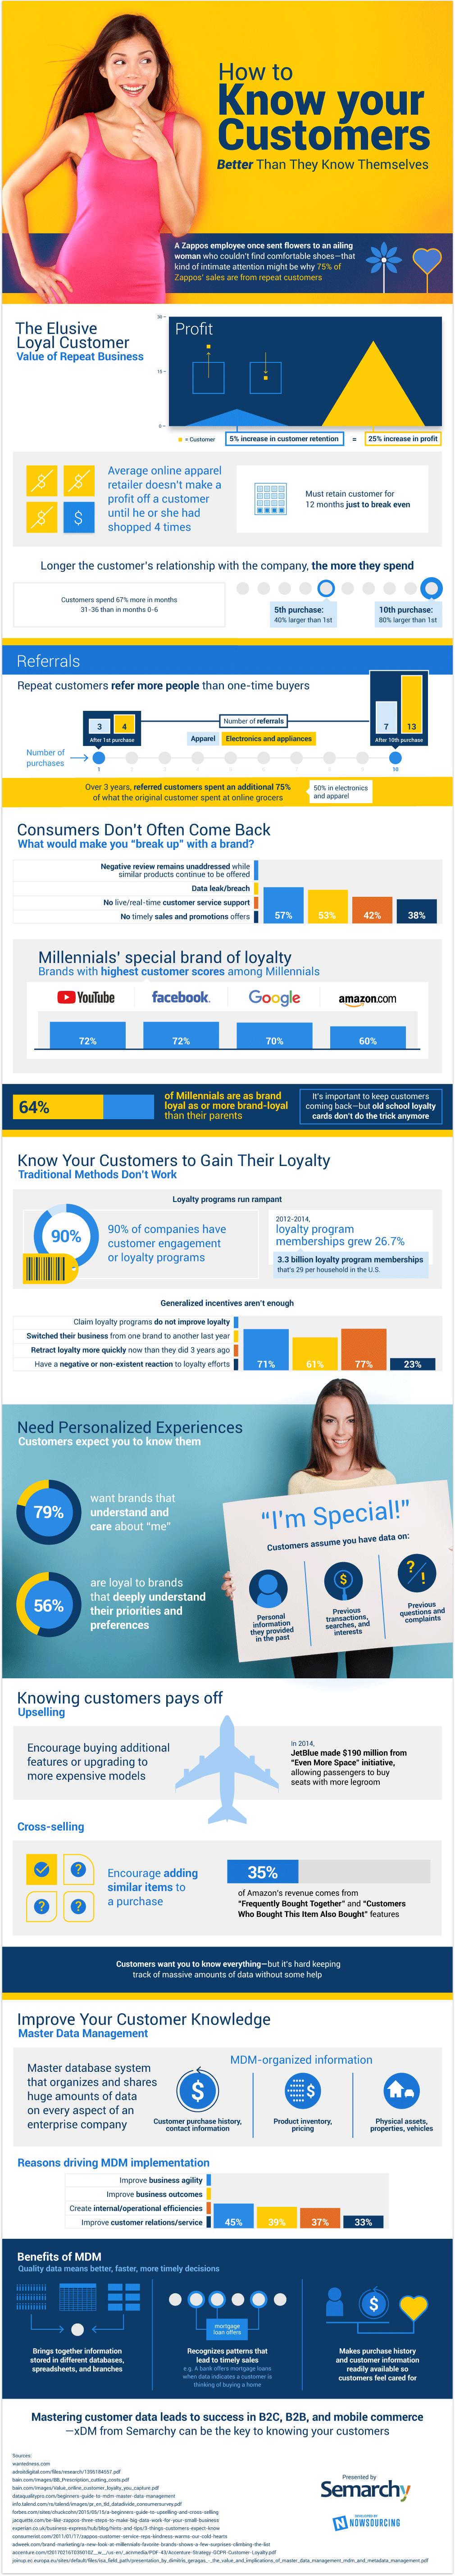 Customer MDM Infographic Upsell Cross-Sell Image